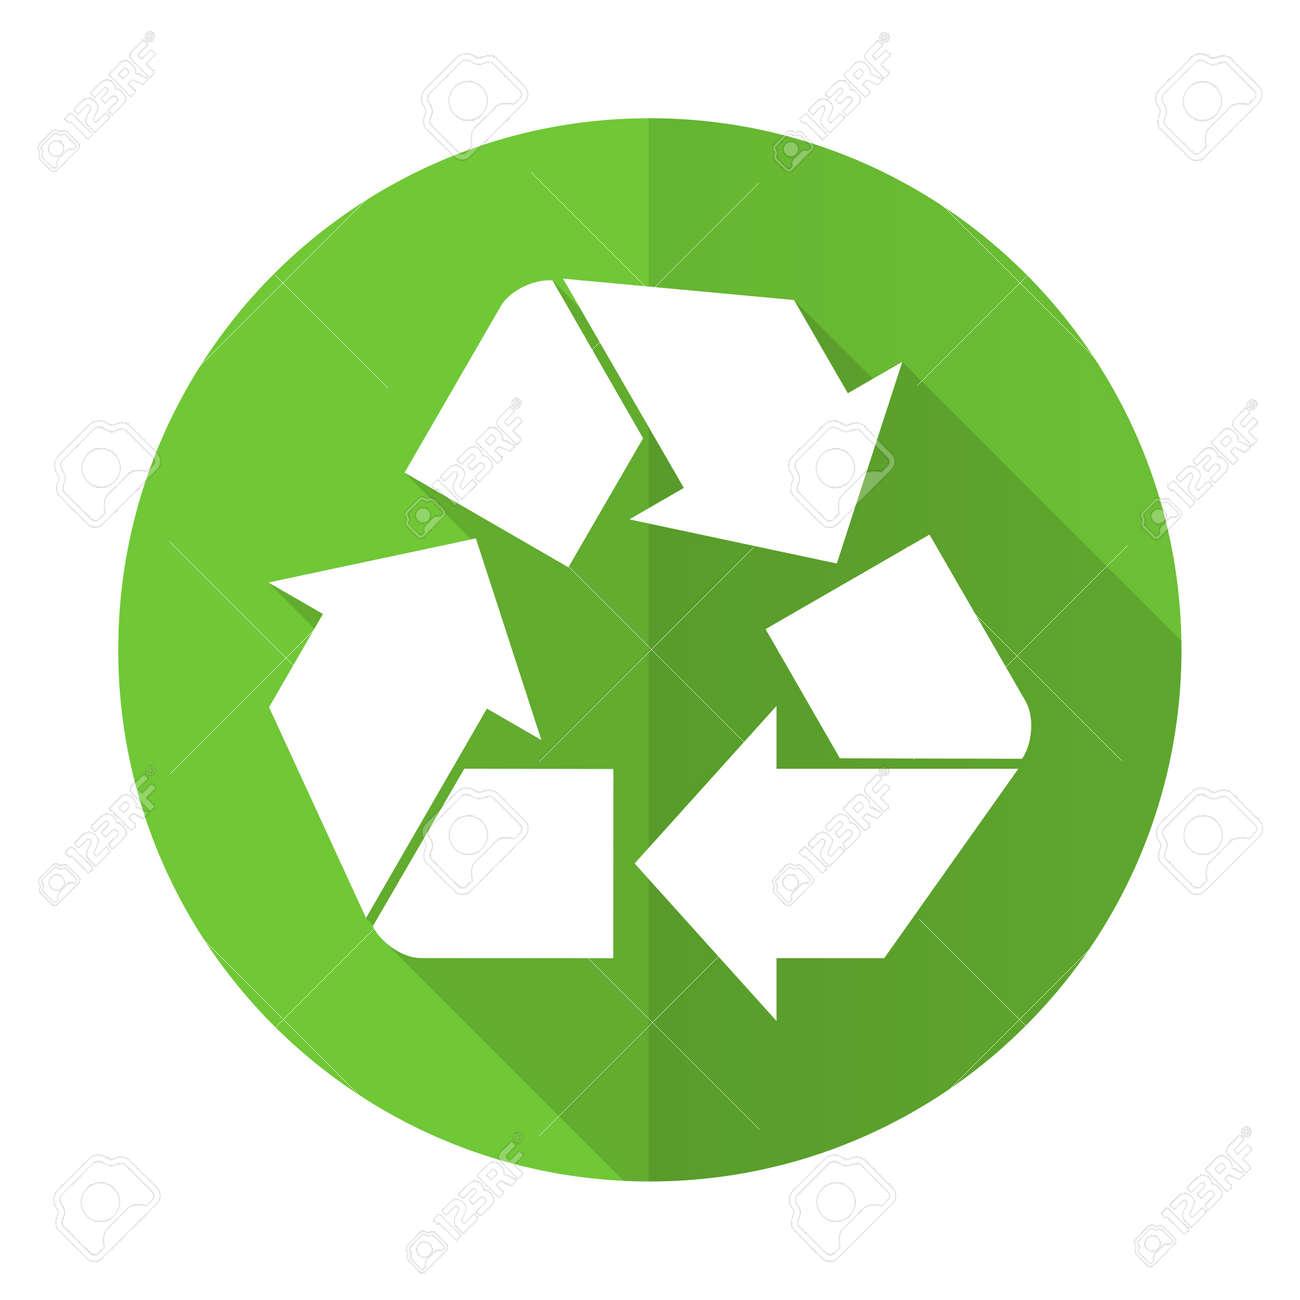 recyclage - Photo